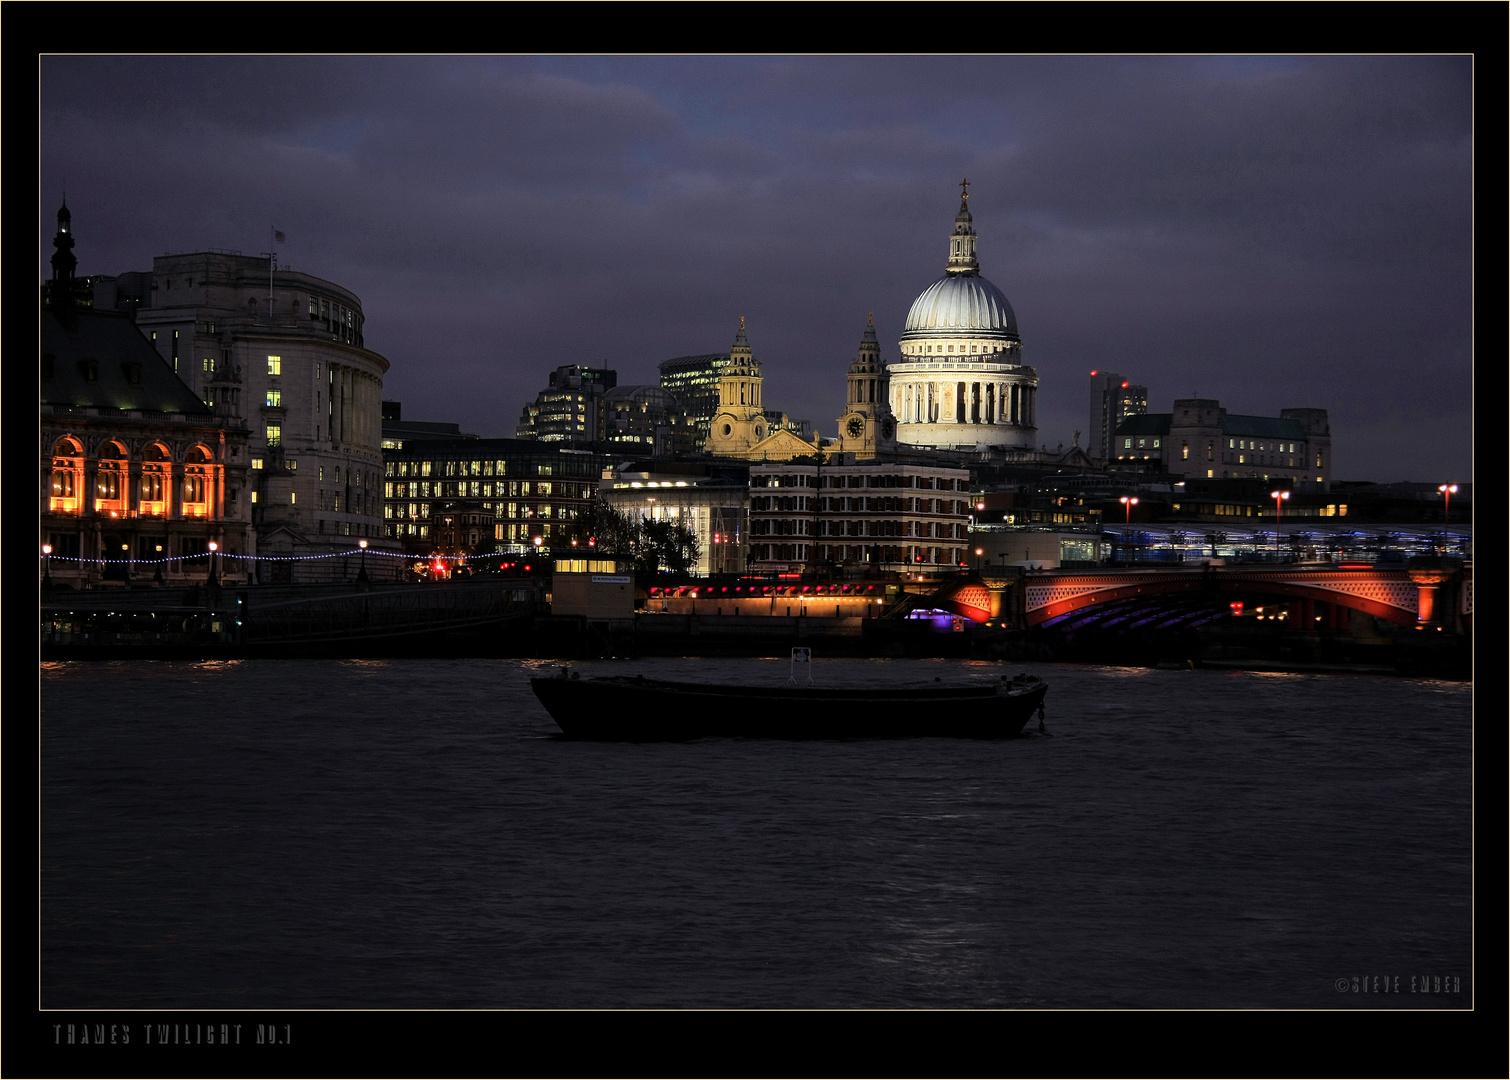 Thames Twilight No.1